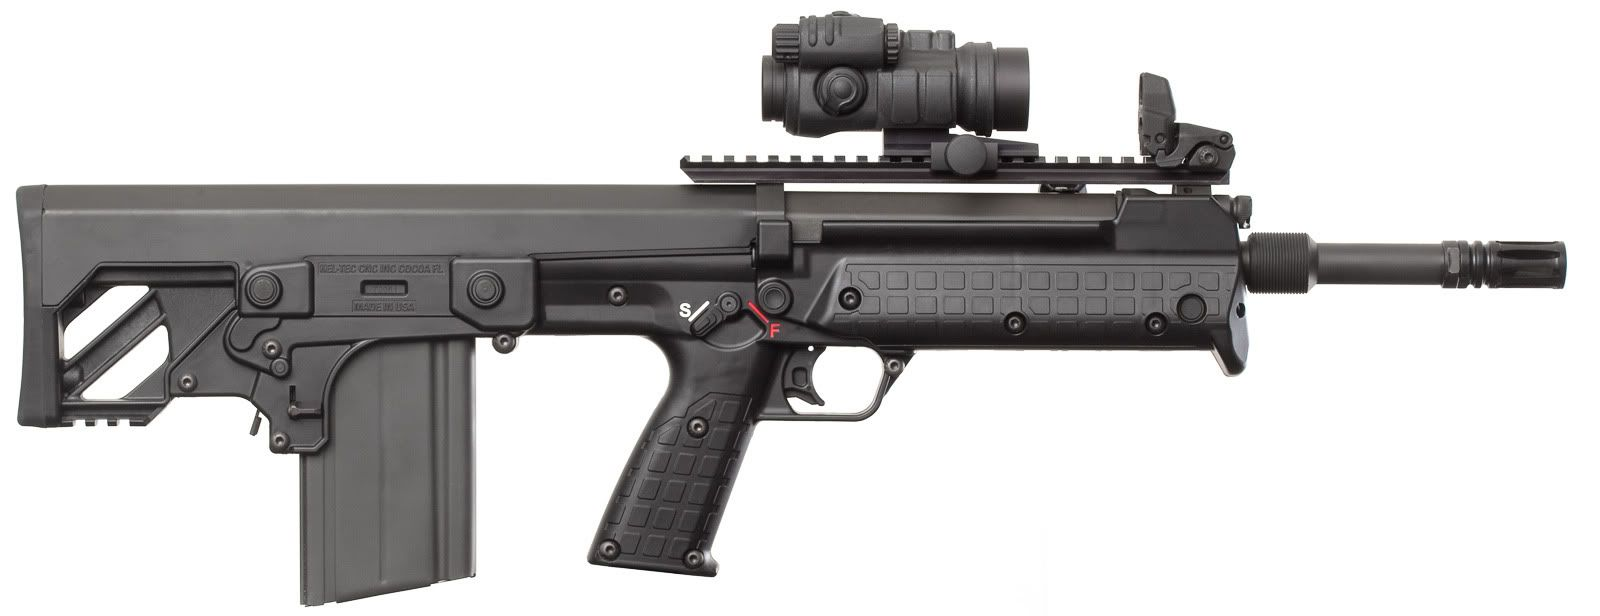 Kel Tec Rfb 308 Bullpup Rifle Looks Like An Updated Sa80